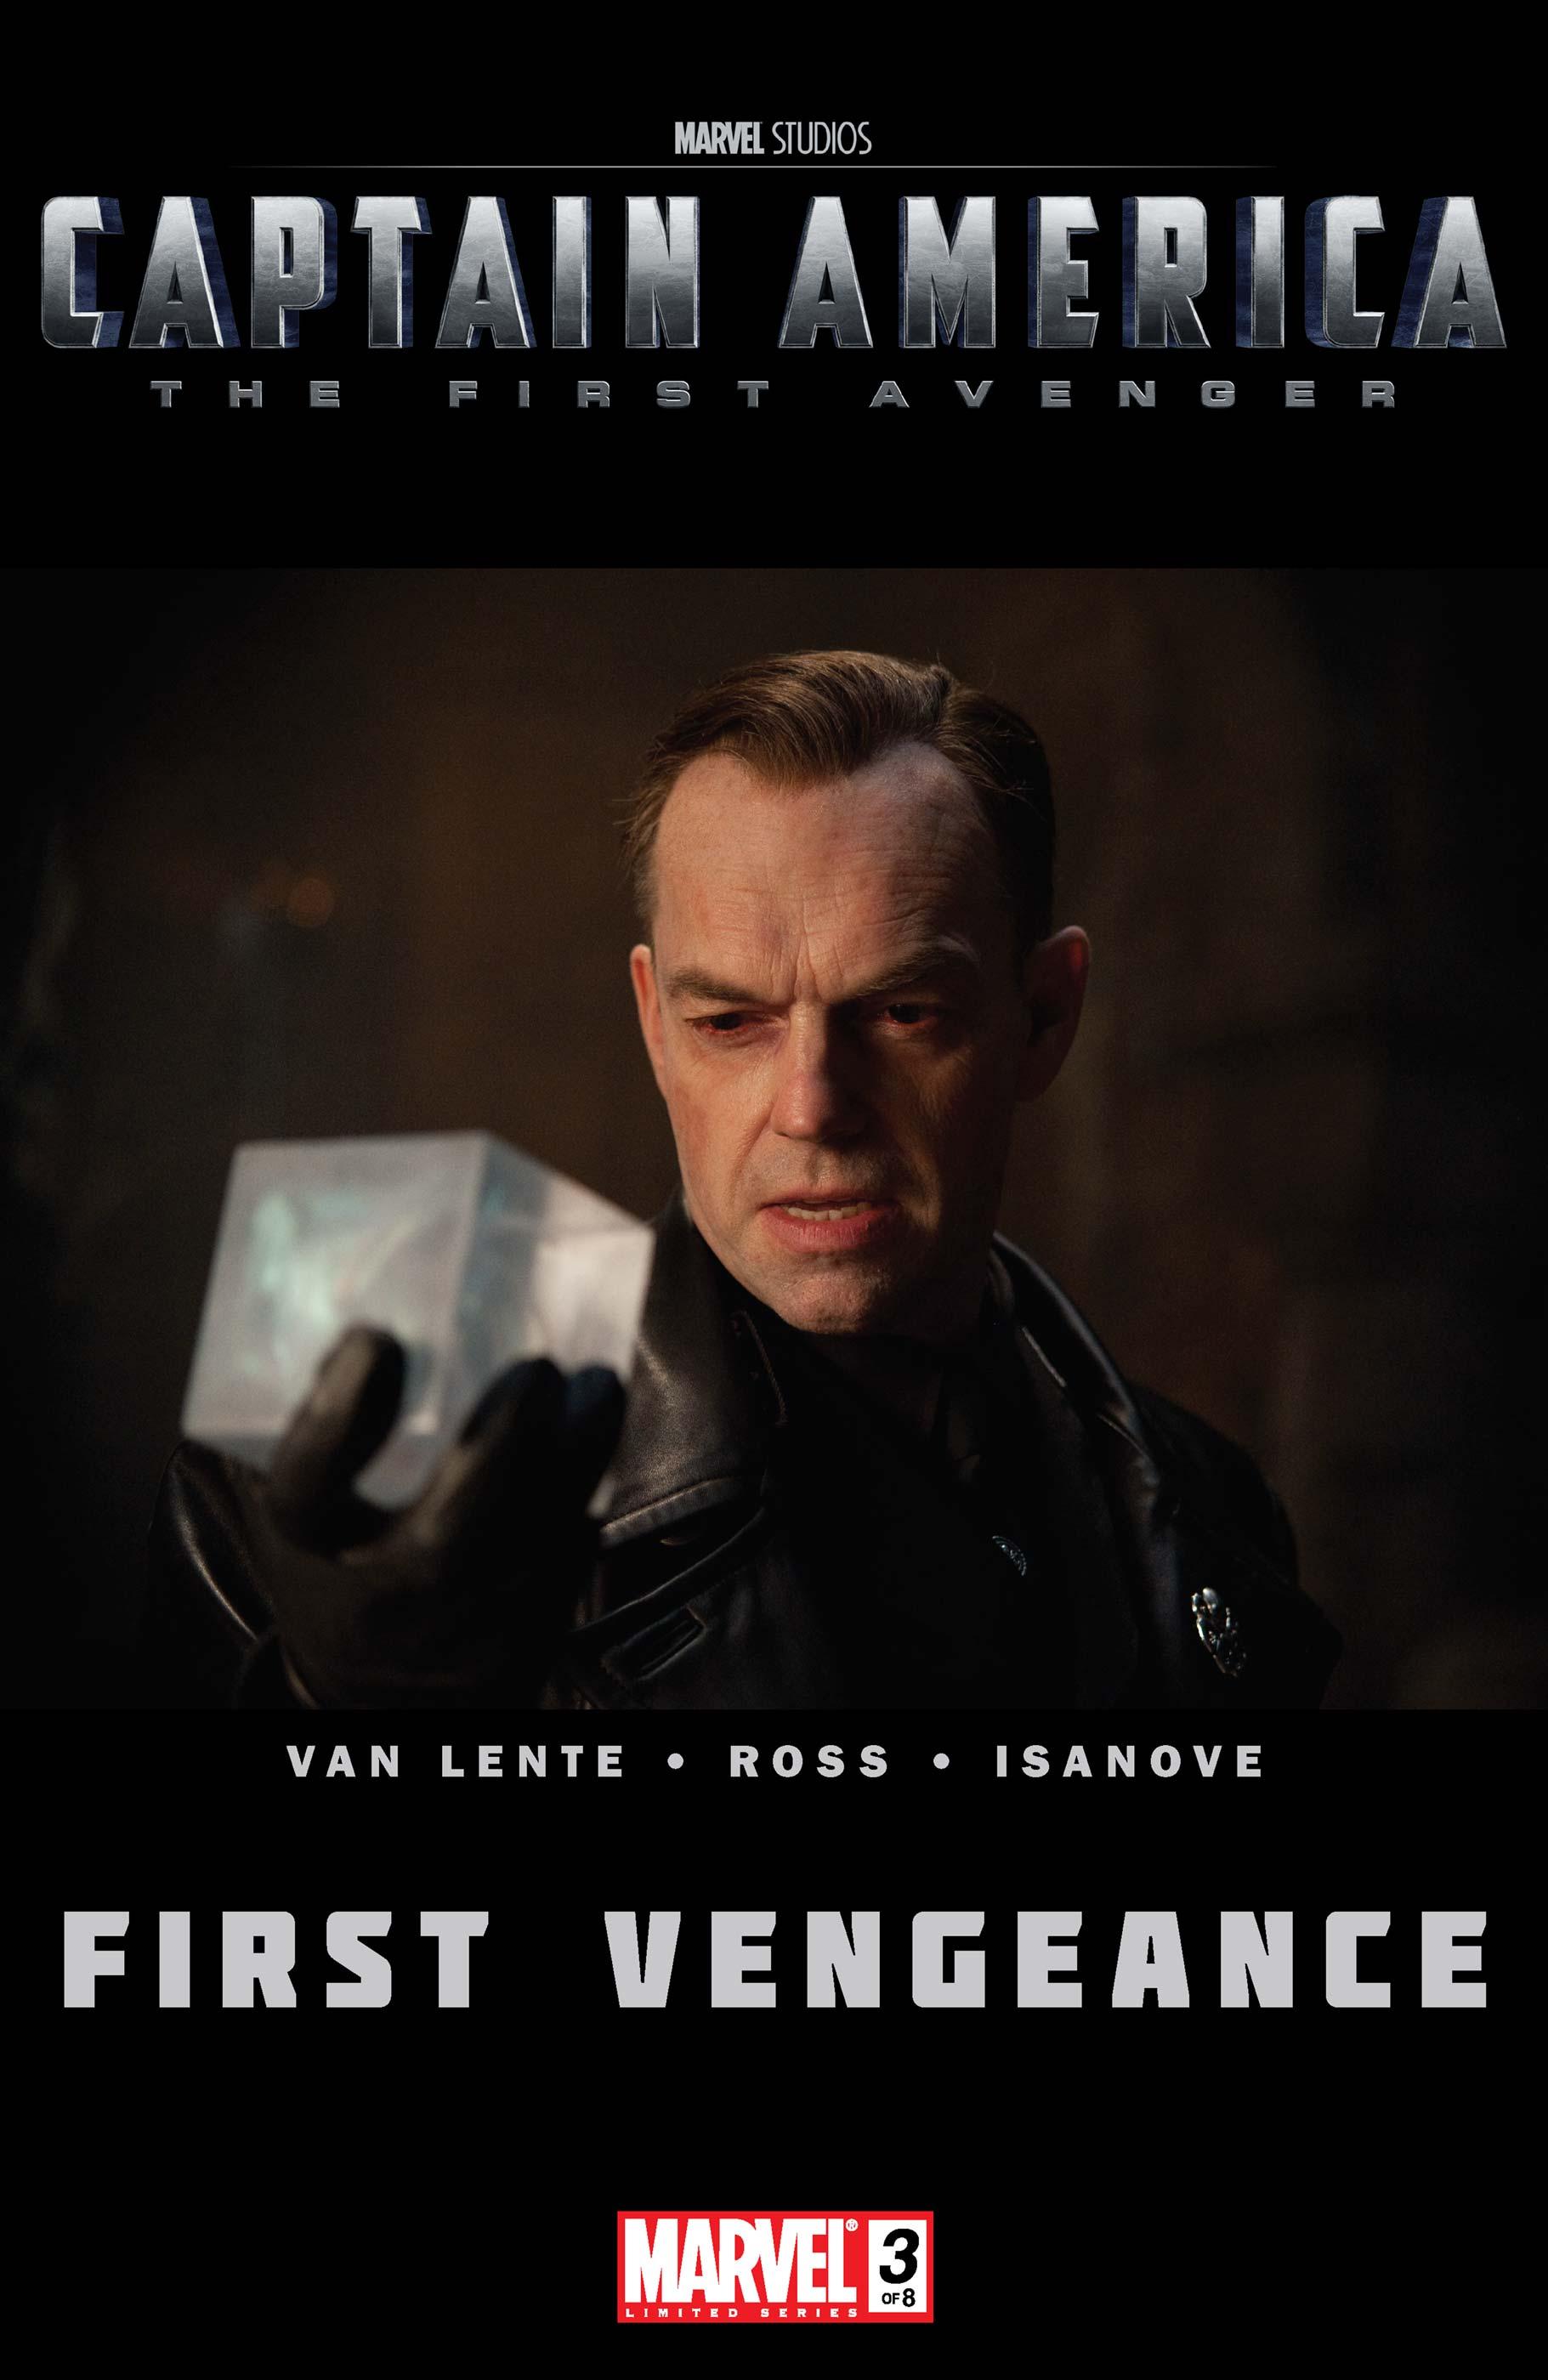 Captain America: First Vengeance (2011) #3